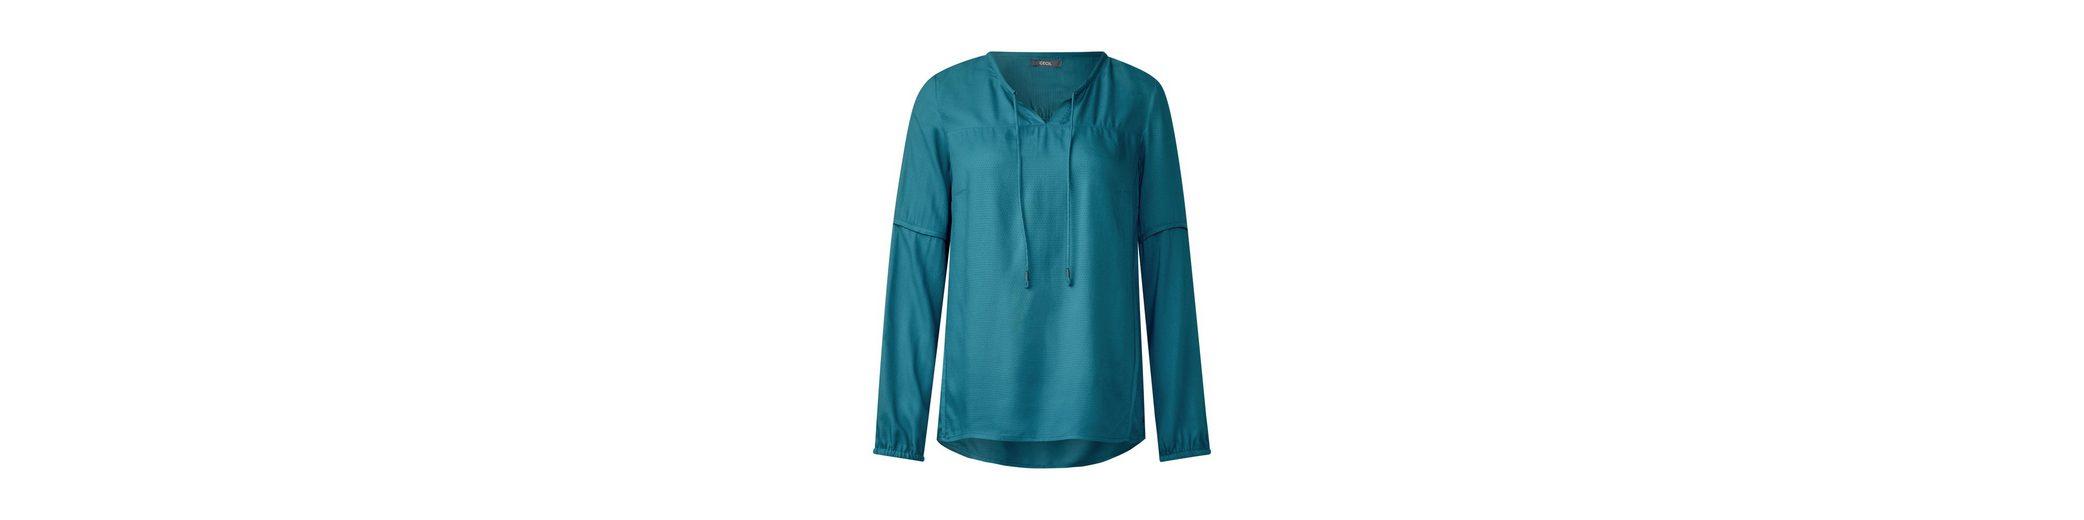 Basic Tunika Bluse CECIL Basic Tunika Basic Style Tunika Style Style Basic Bluse CECIL CECIL Bluse CECIL dqwnC6